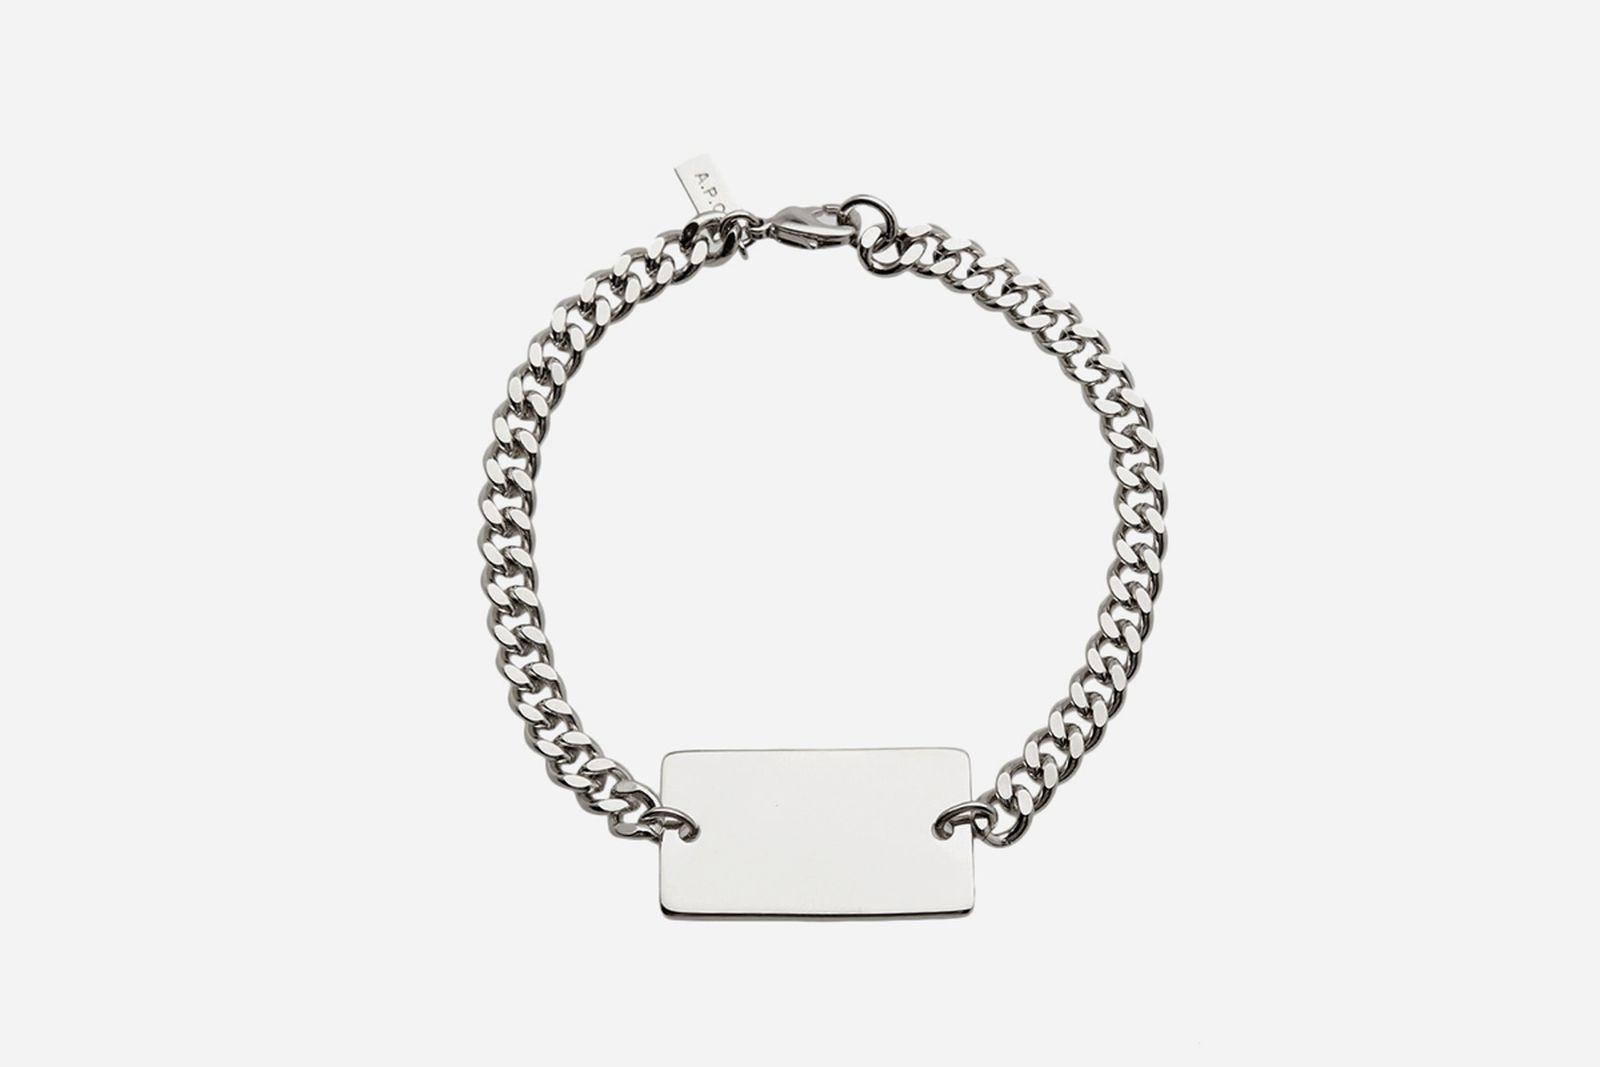 26 10 2017 apc lordbracelet silver meacc h70307 rab hh 1 Margiela Stüssy end